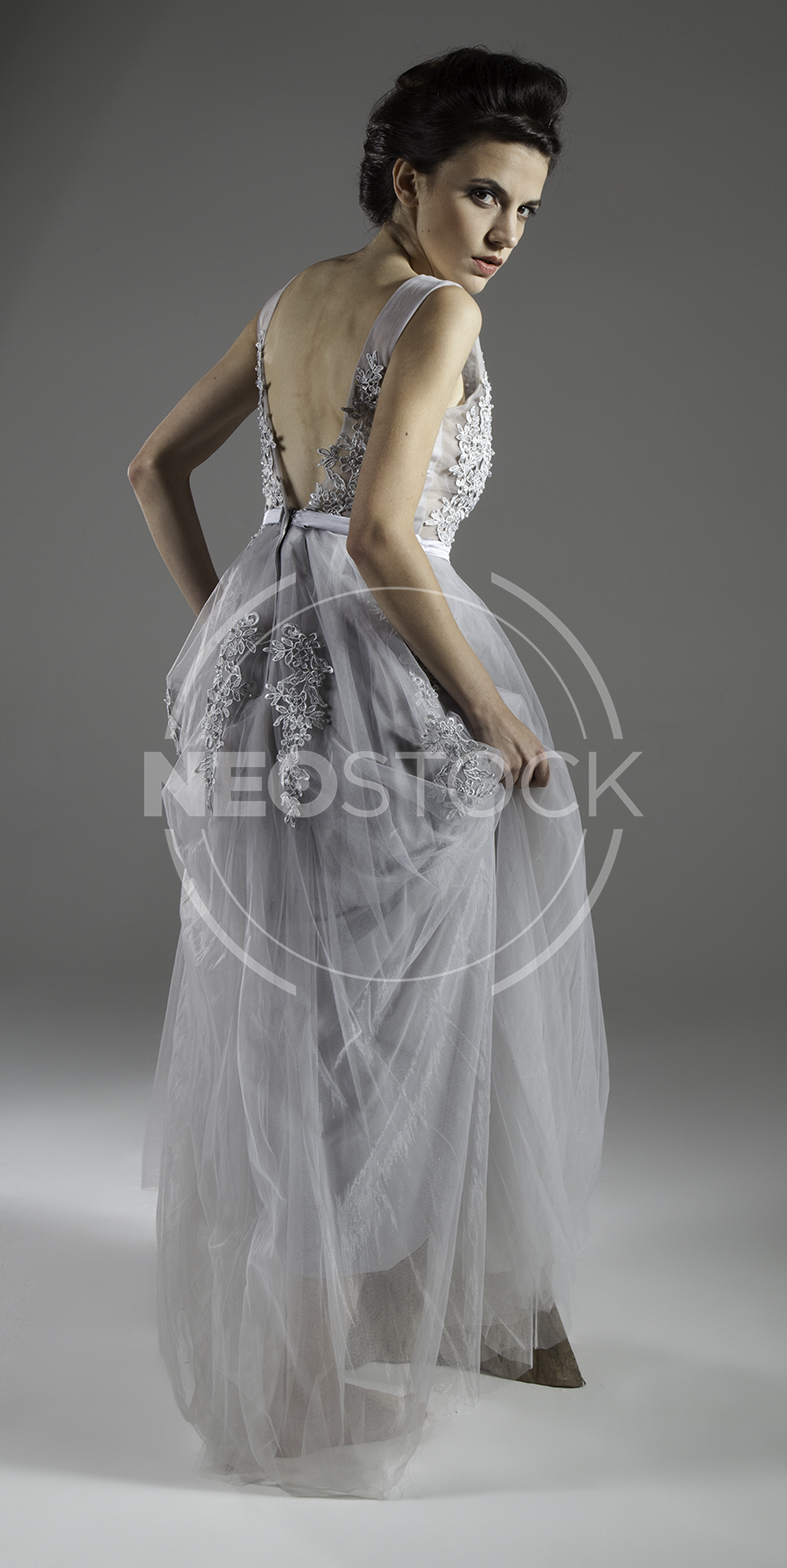 NeoStock - Liepa Contemporary Dress V - Stock Photography